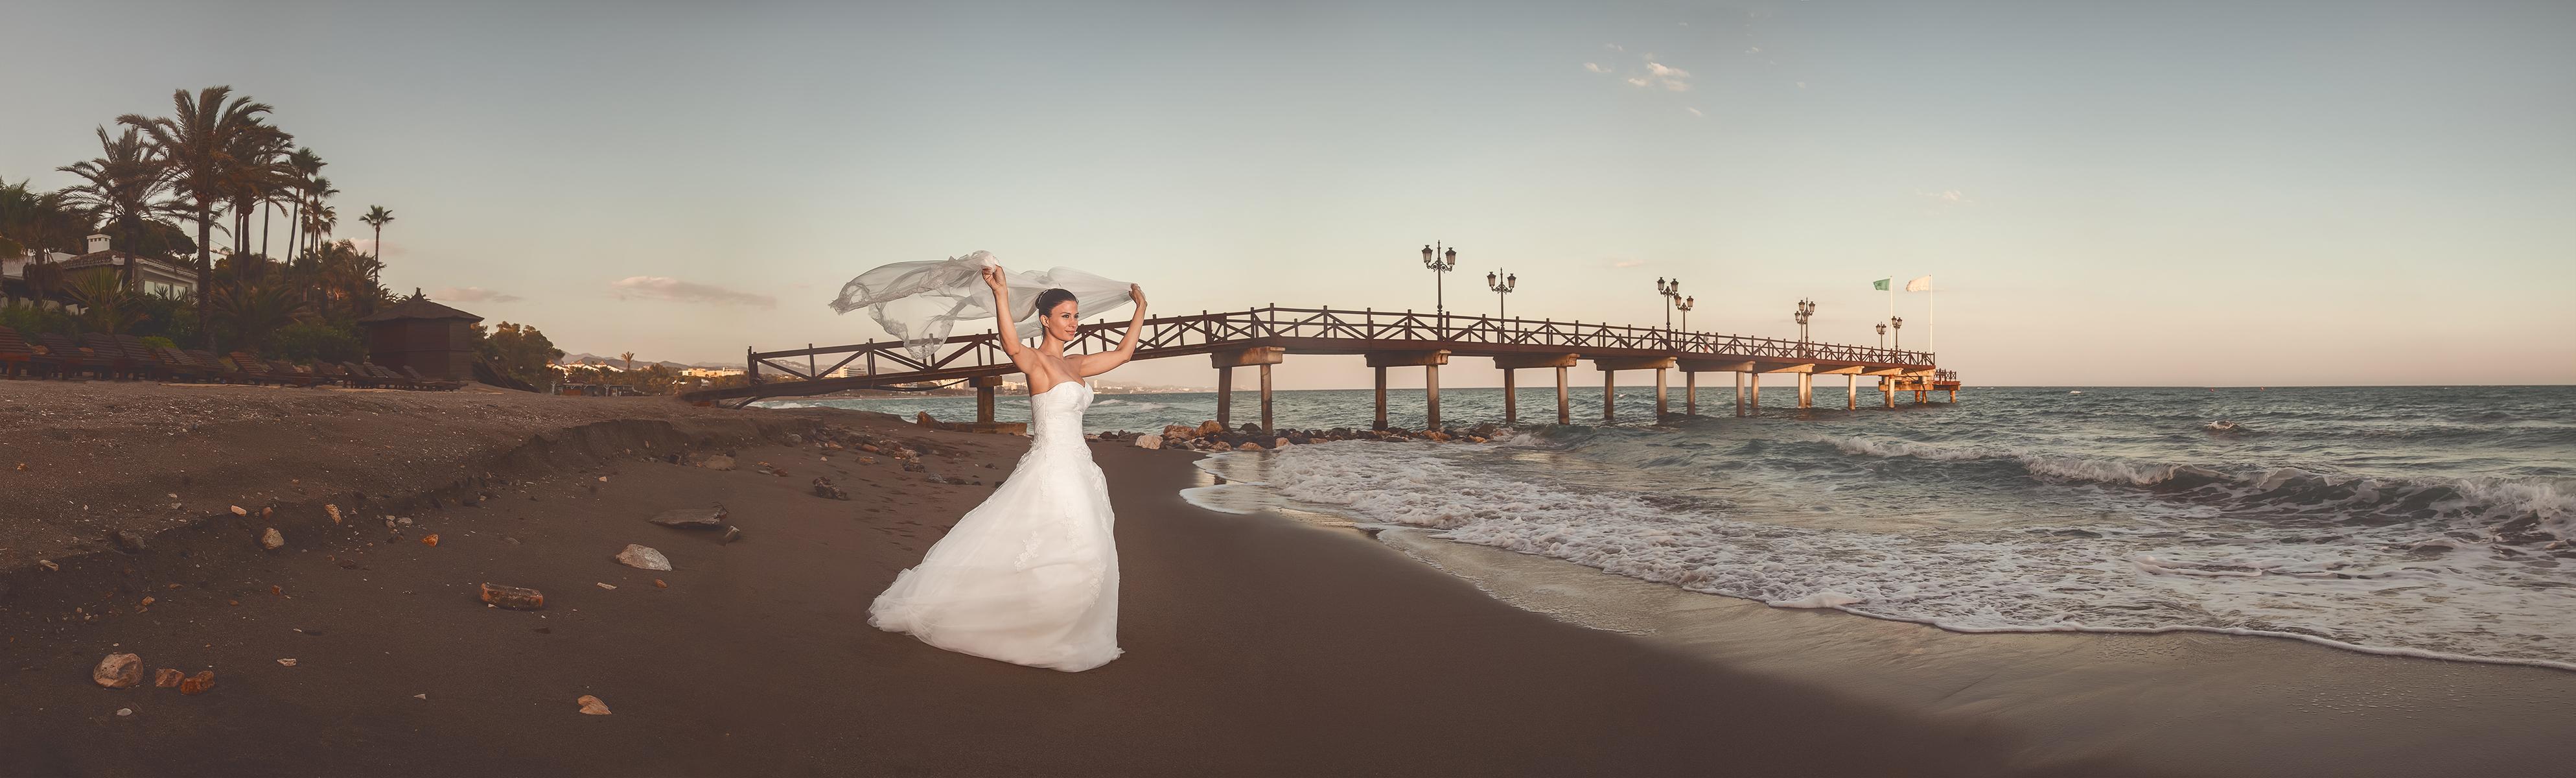 Best Wedding Photographer Malta Uldis Lapins Photography 462